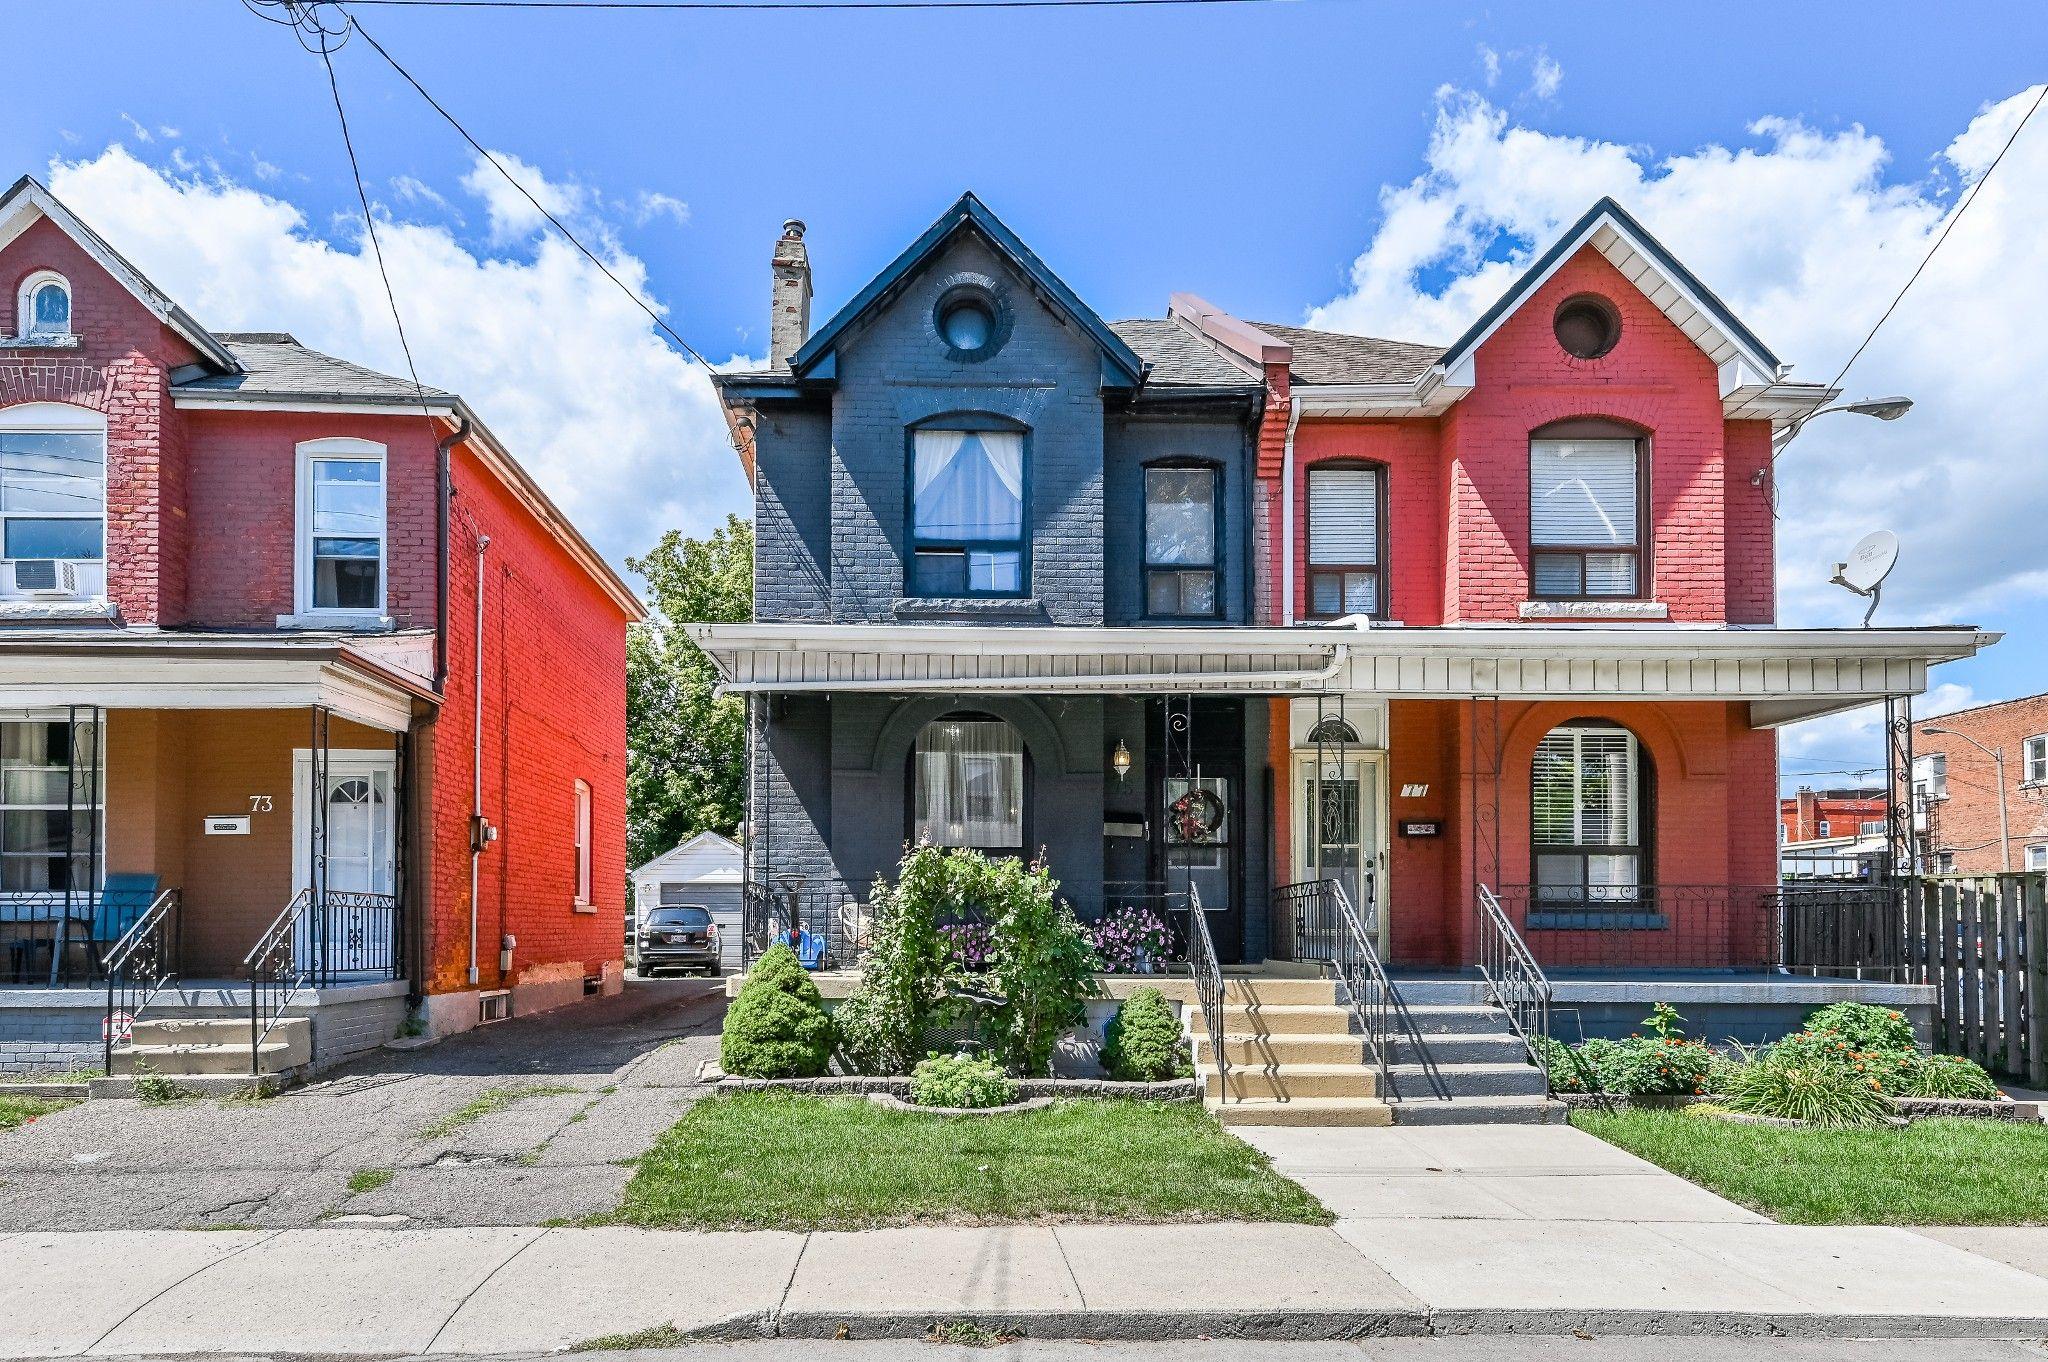 Main Photo: 75 Kindrade Avenue in Hamilton: House for sale : MLS®# H4086008